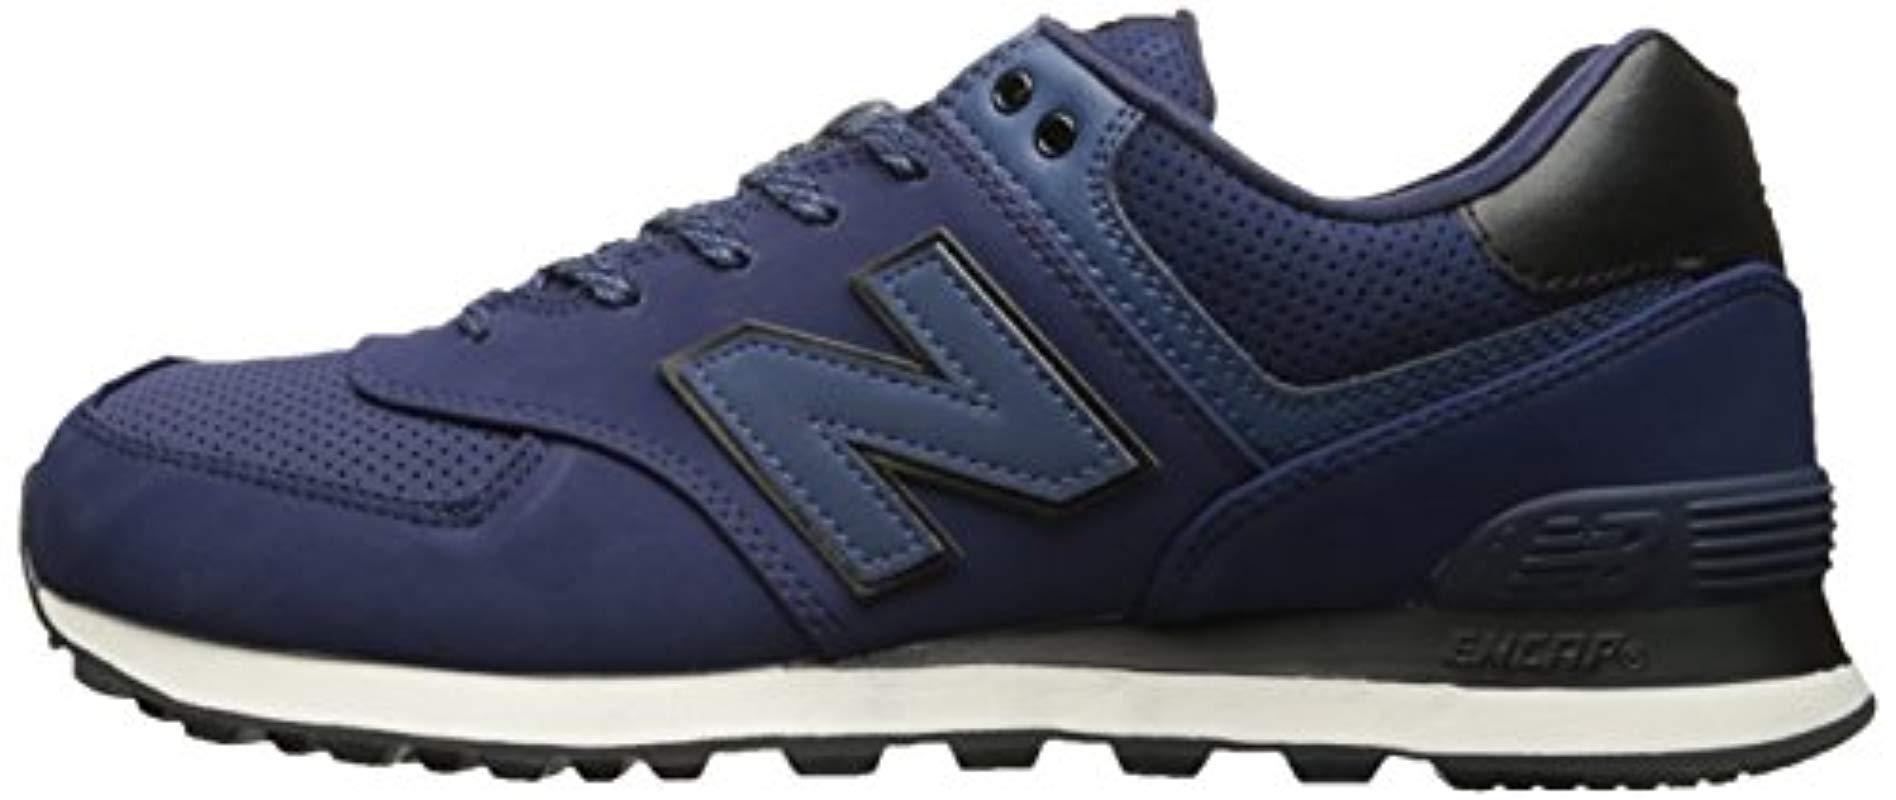 New Balance 574v1 Core Plus Sneaker in Blue for Men - Lyst